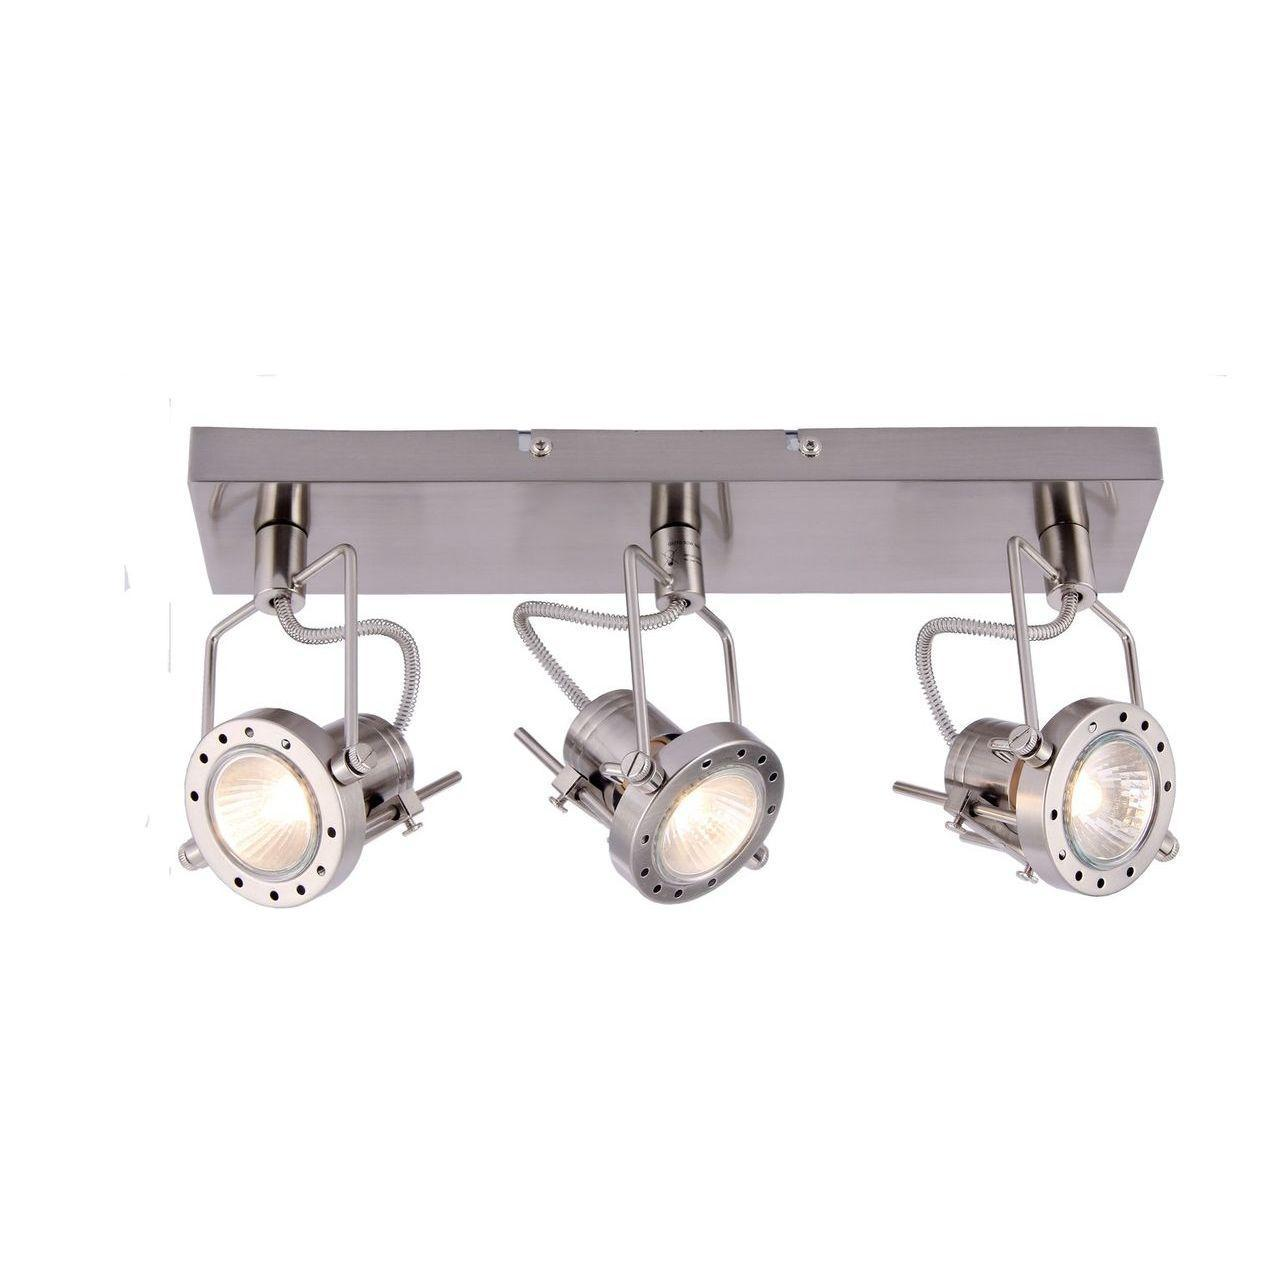 Фото - Спот Arte Lamp Costruttore A4300PL-3SS спот arte lamp costruttore a4300pl 4ab